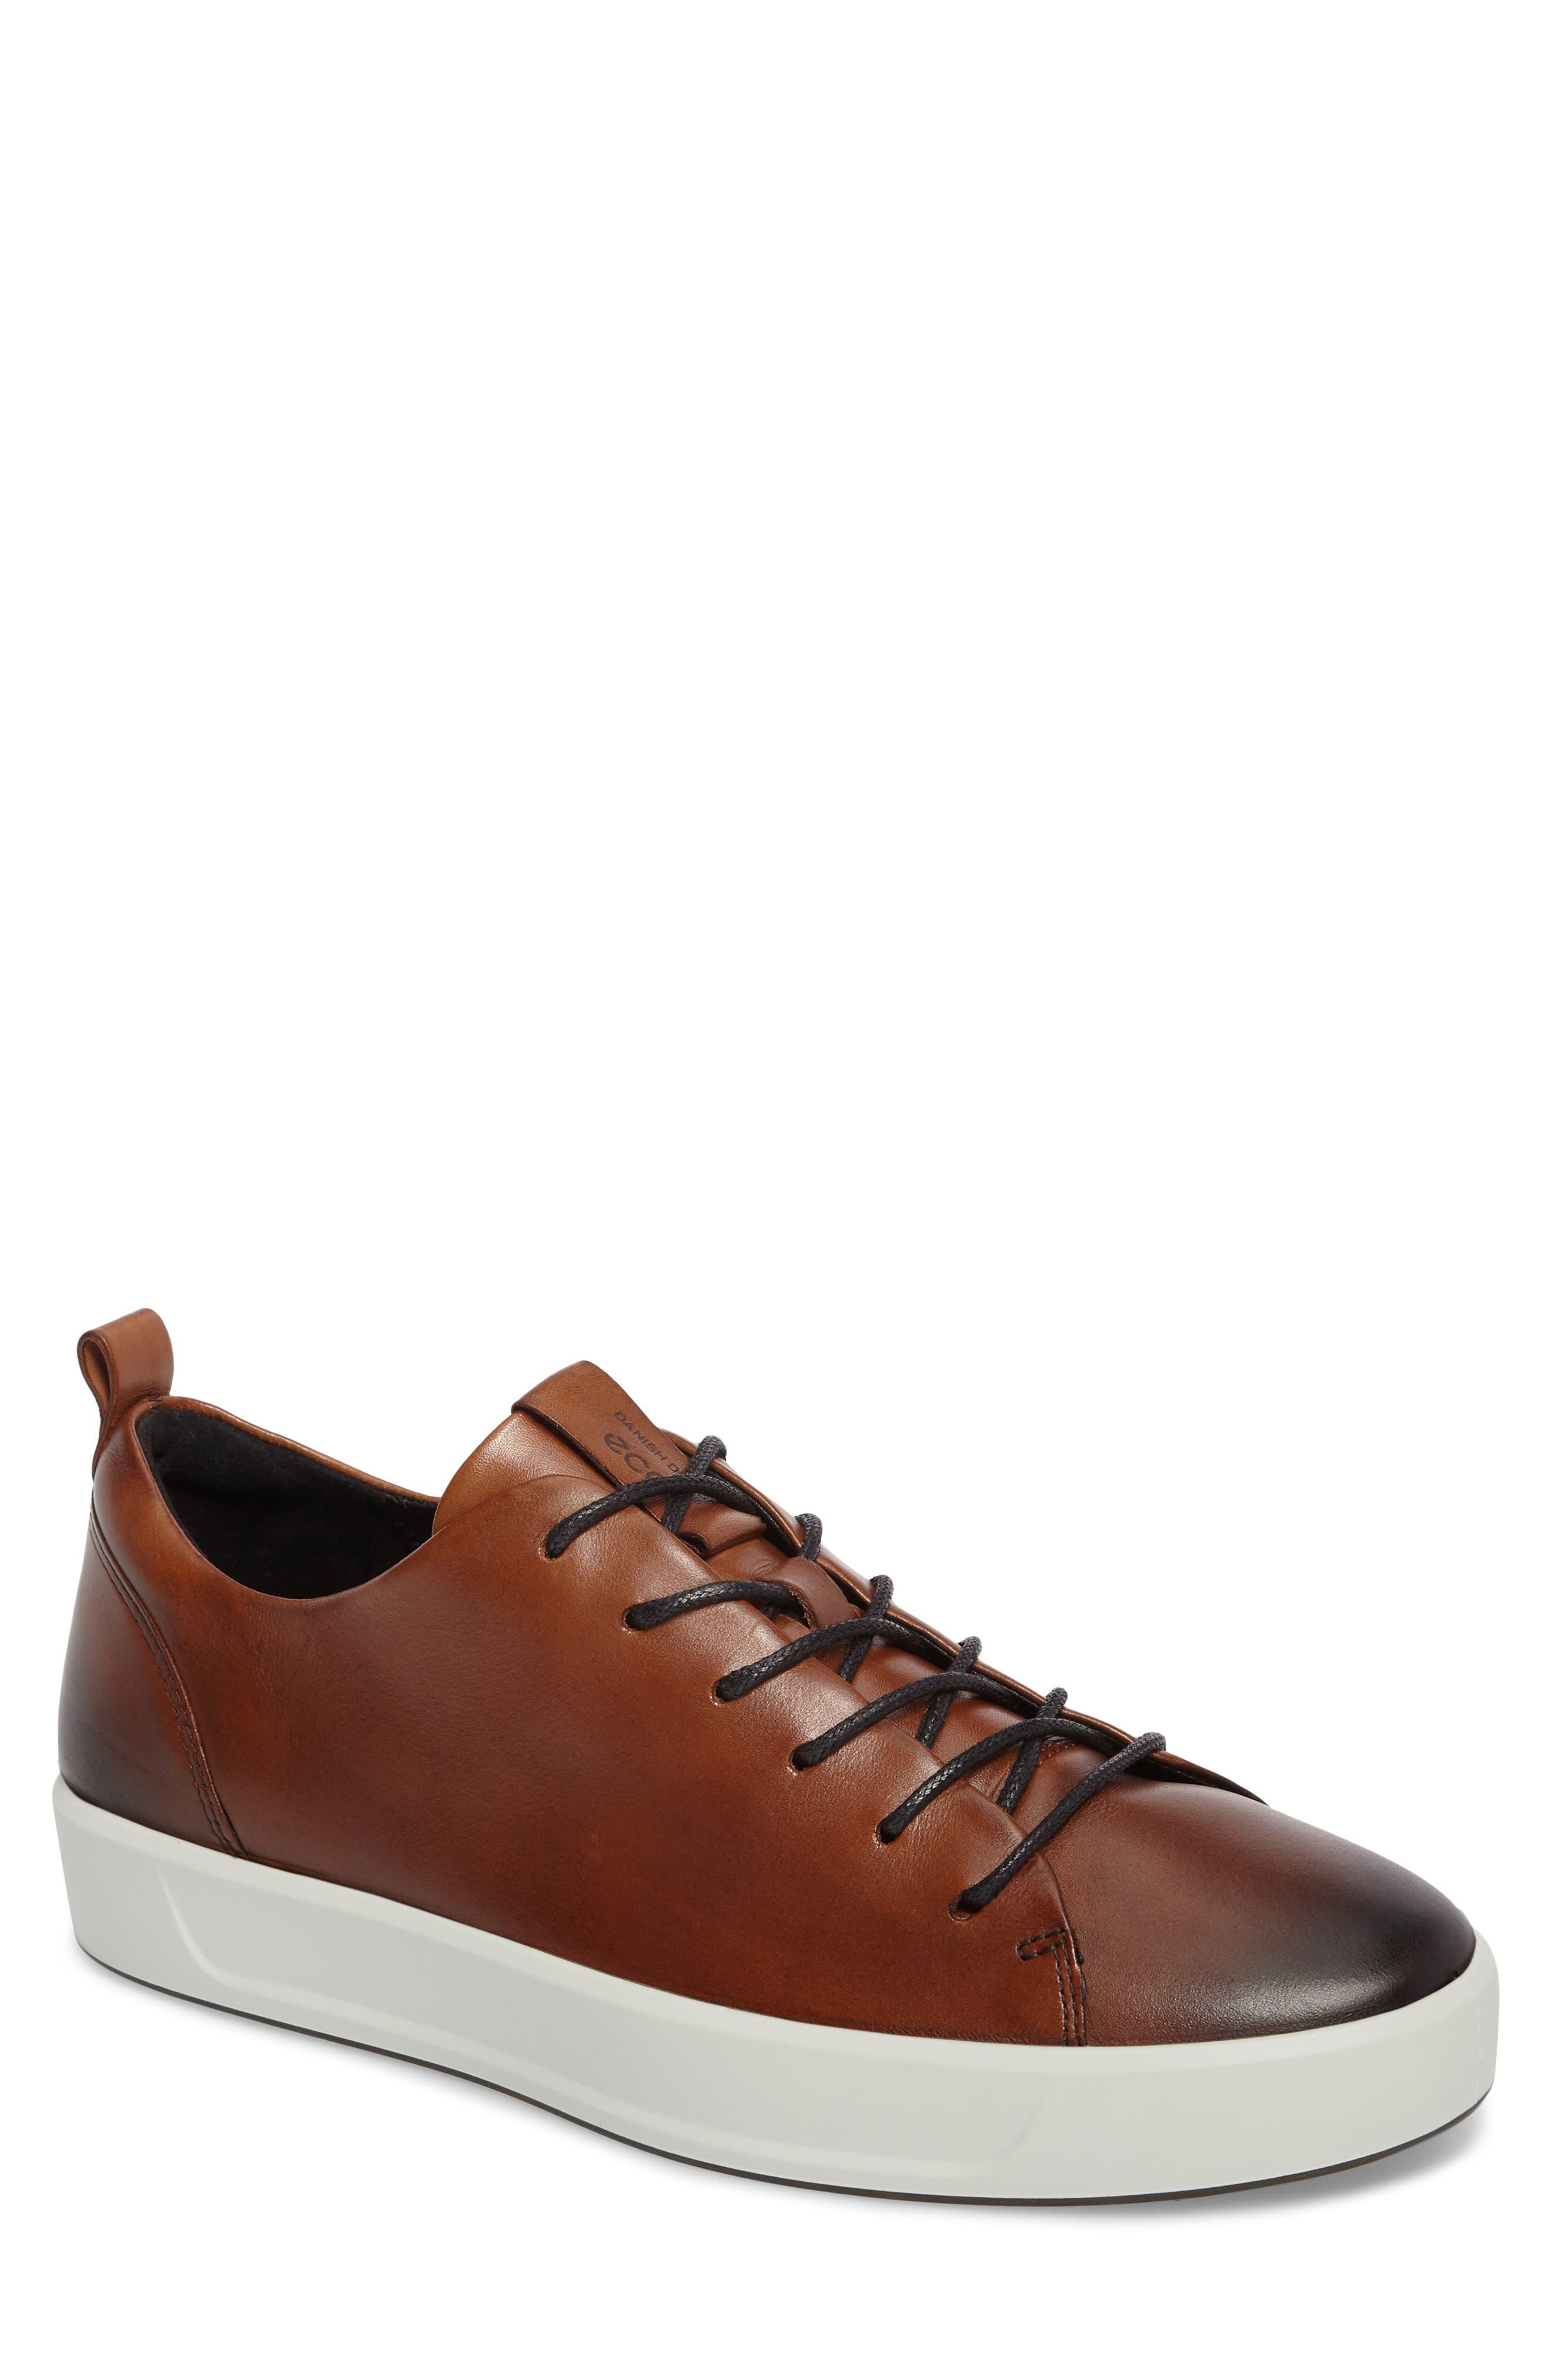 Soft 8 Street Sneaker,                         Main,                         color, Lion